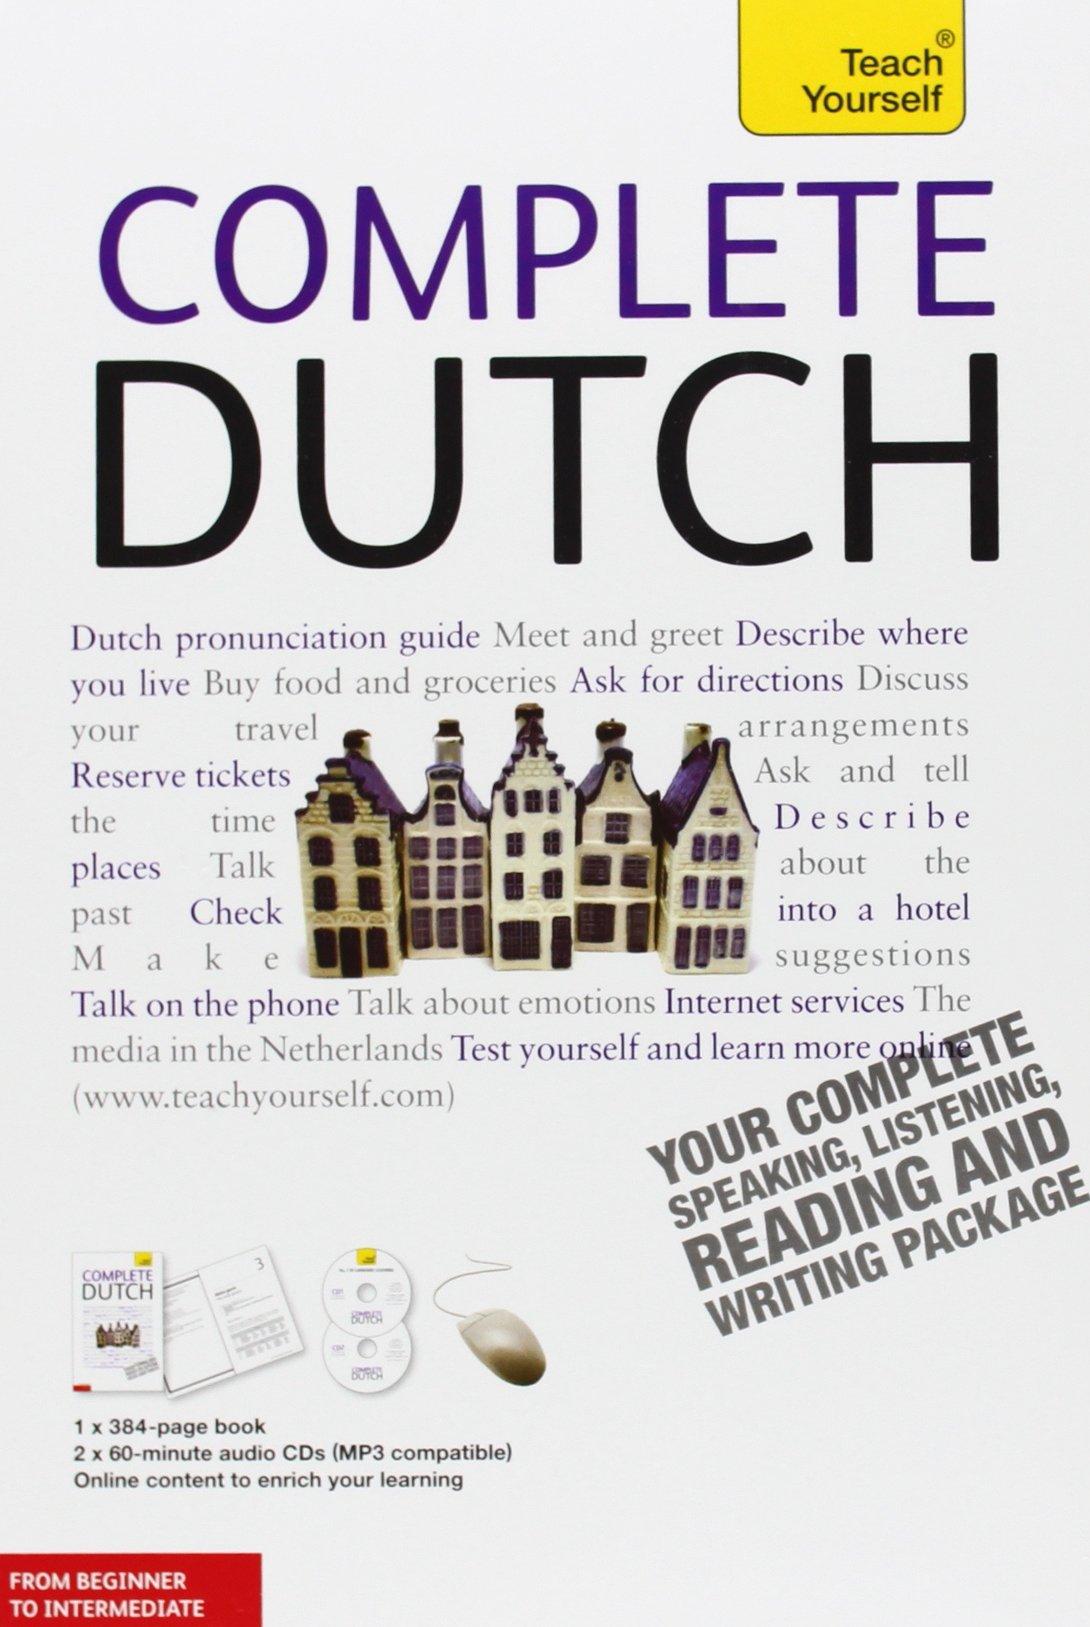 Complete Dutch